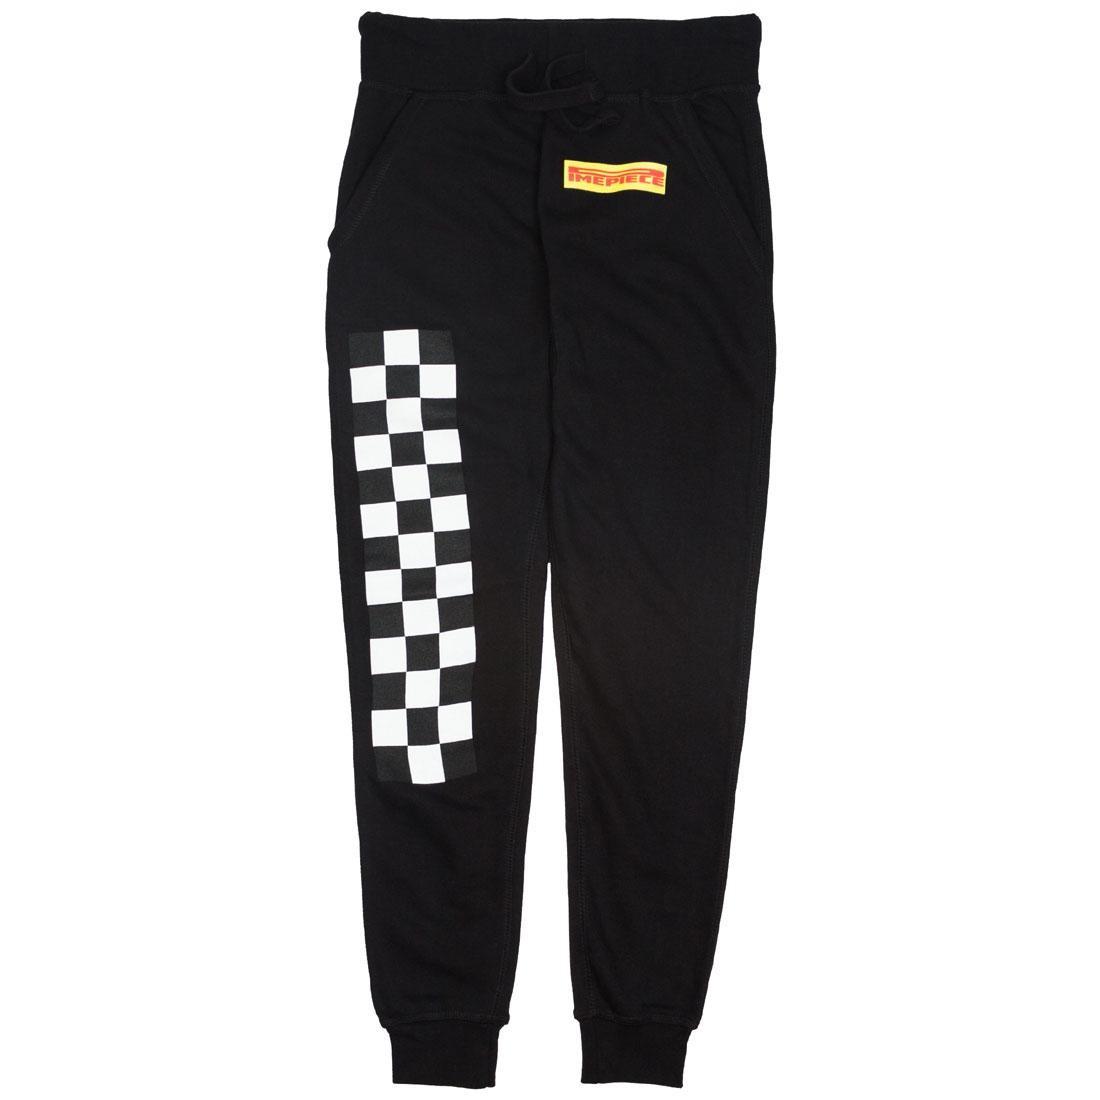 Dimepiece Women Dimepiece Checkers Sweat Pants (black)